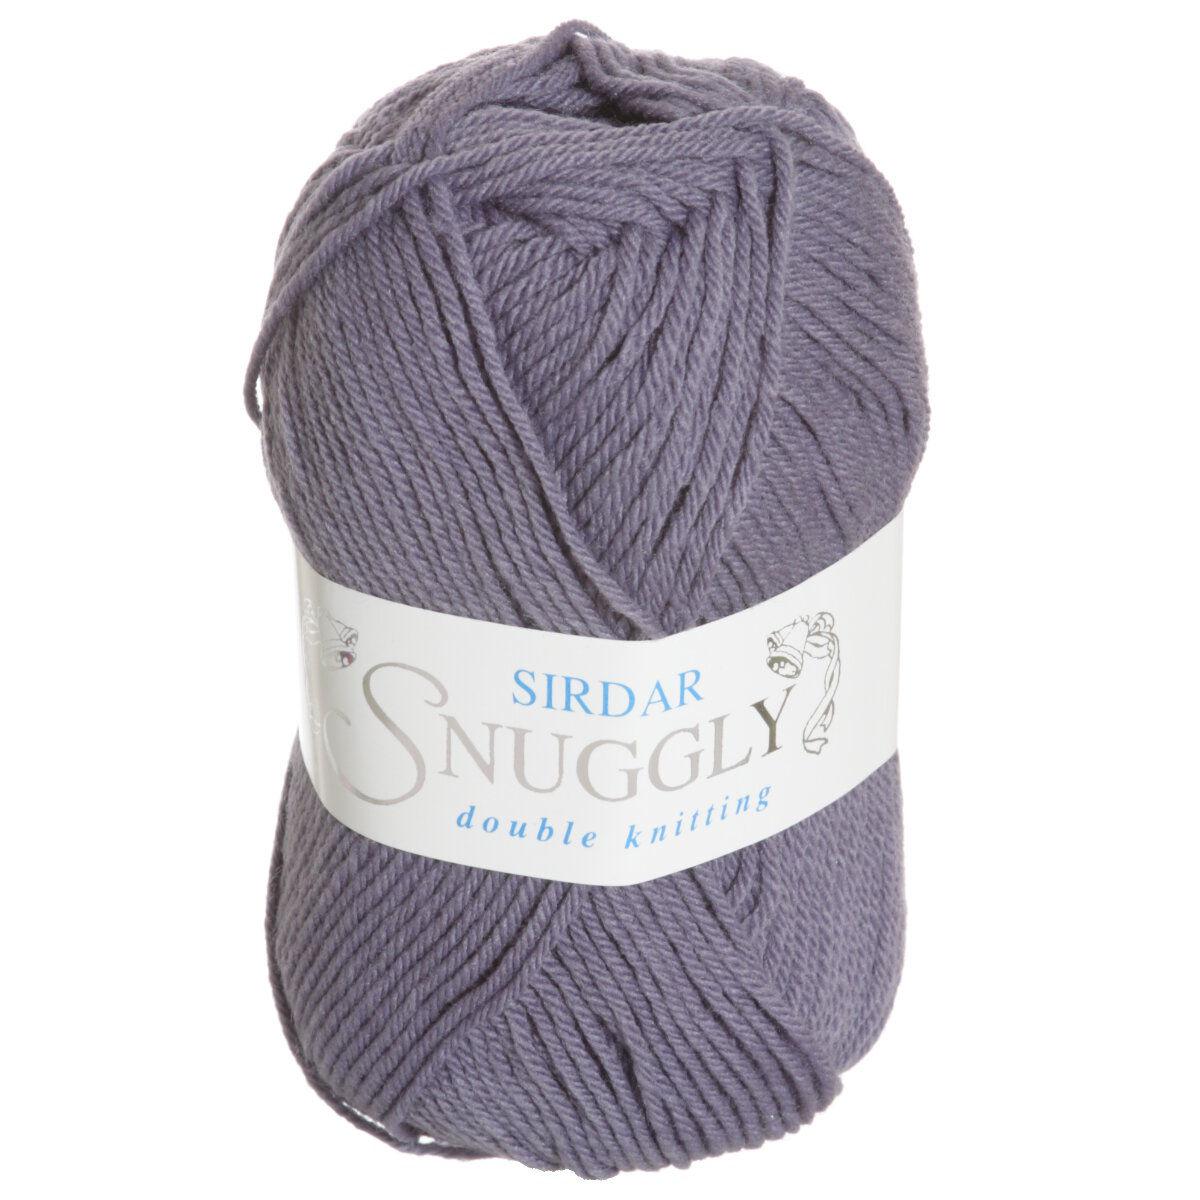 Knitted Tie Patterns : Sirdar Snuggly Snuggly DK Yarn - 0460 Eeyore at Jimmy Beans Wool